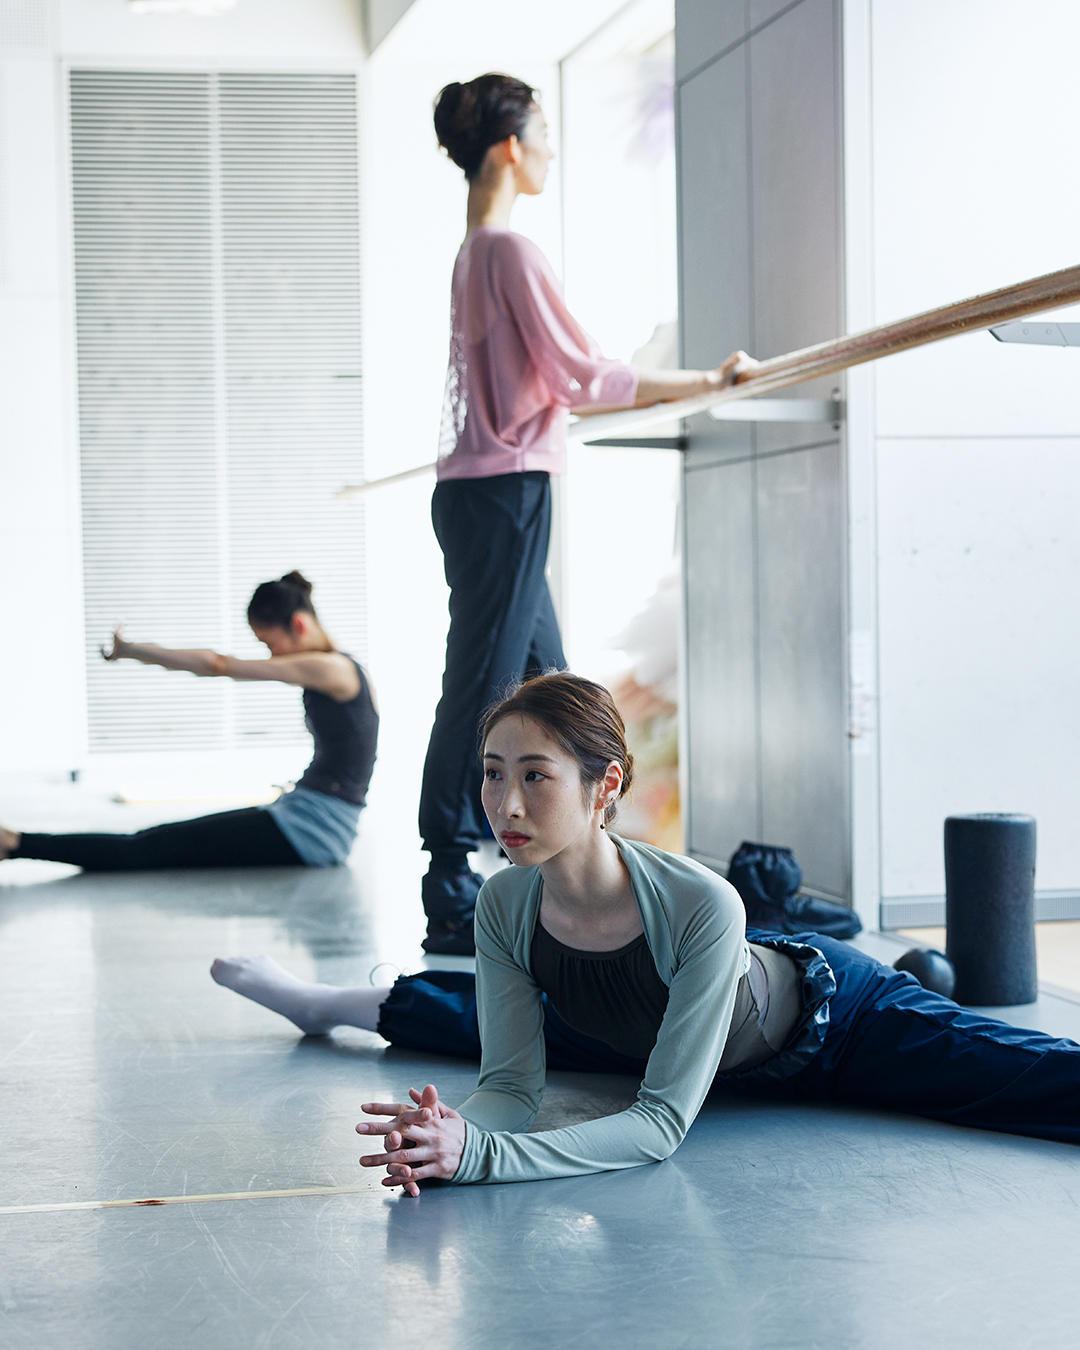 210331_ballet_warmup_3.jpg